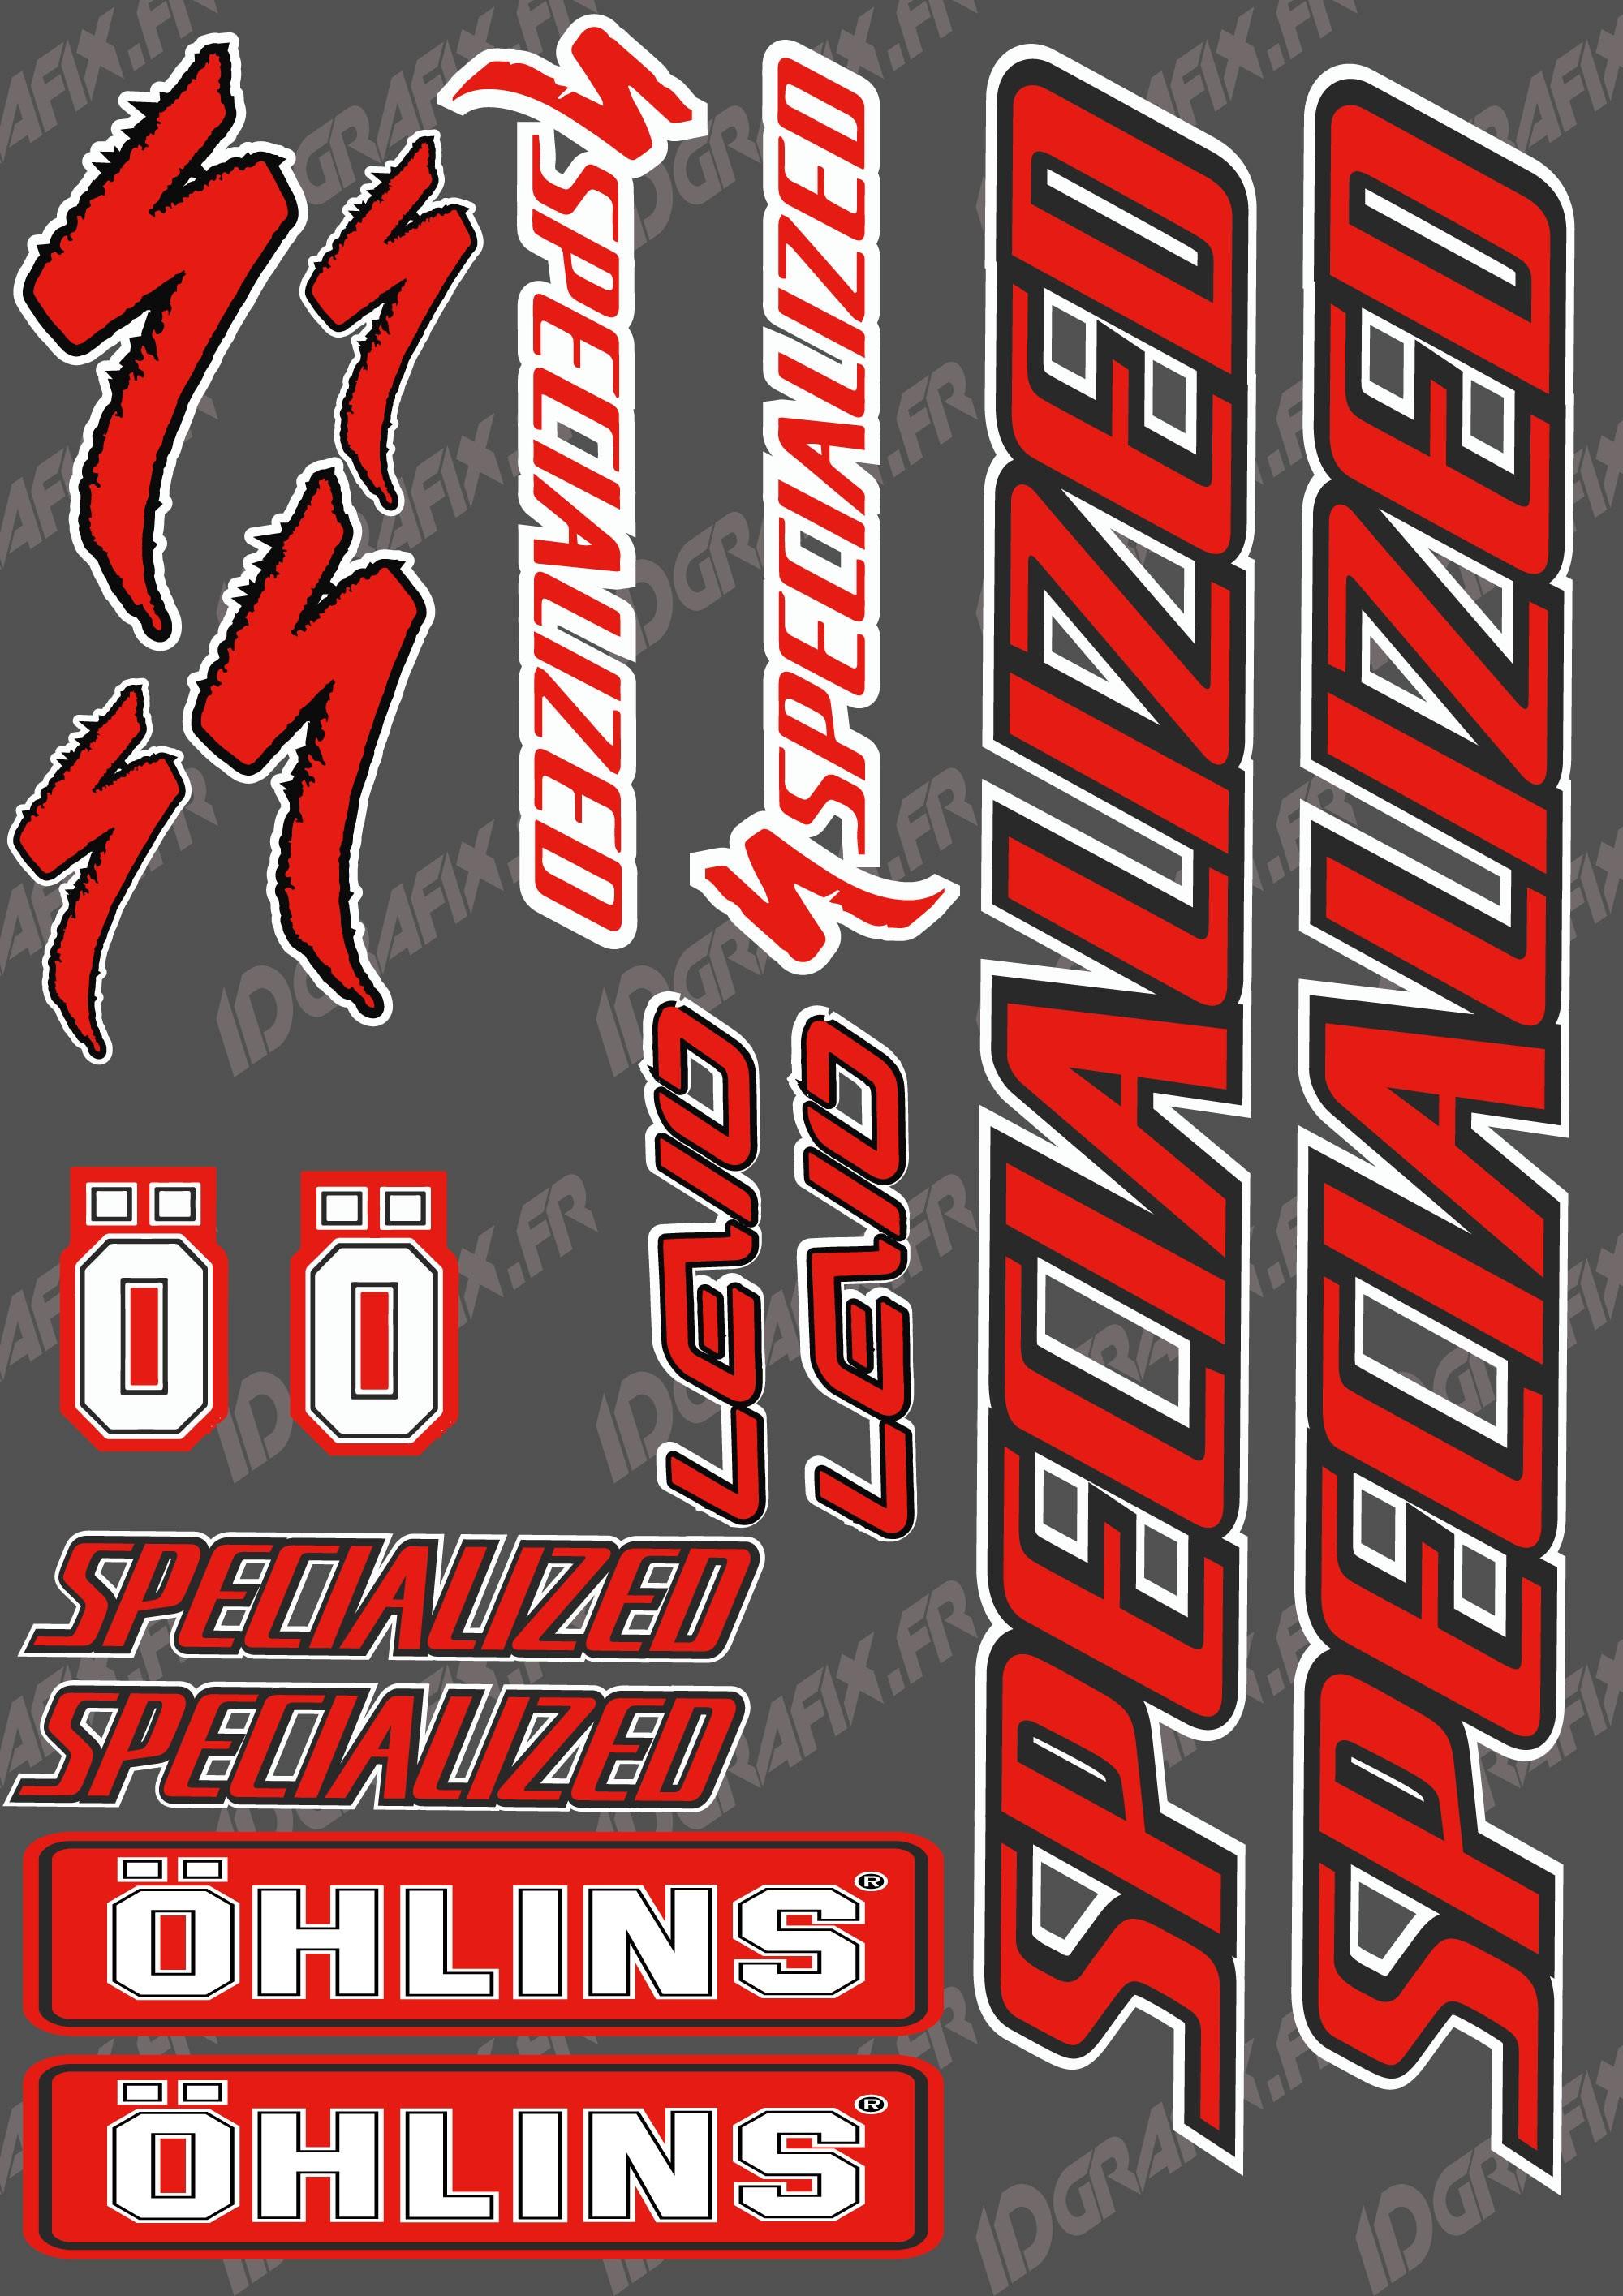 Board sticker 21x30cm red black specialized ohlins idgrafix jpg